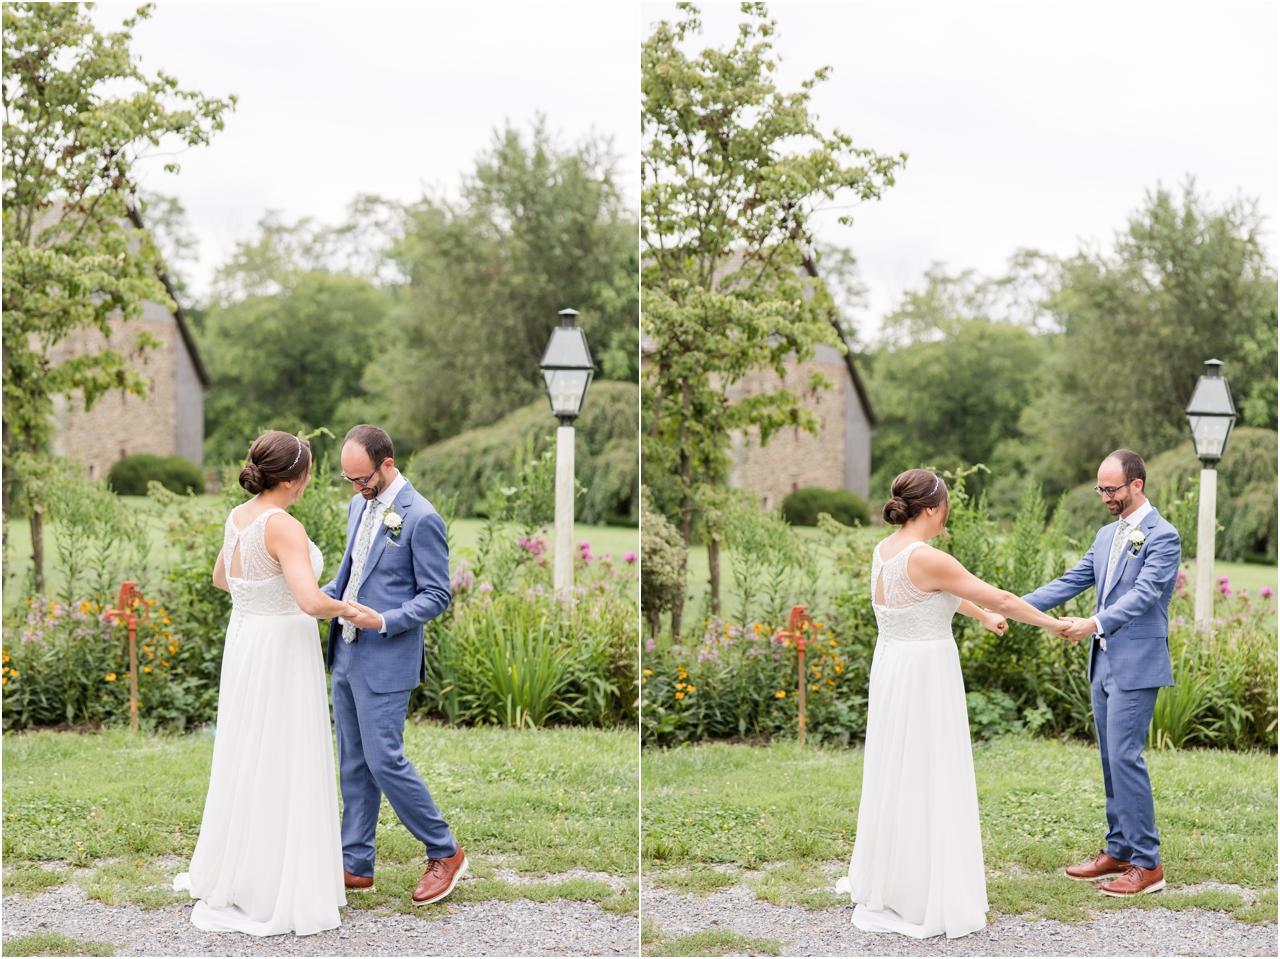 Sylvanside_Farm_Wedding_009